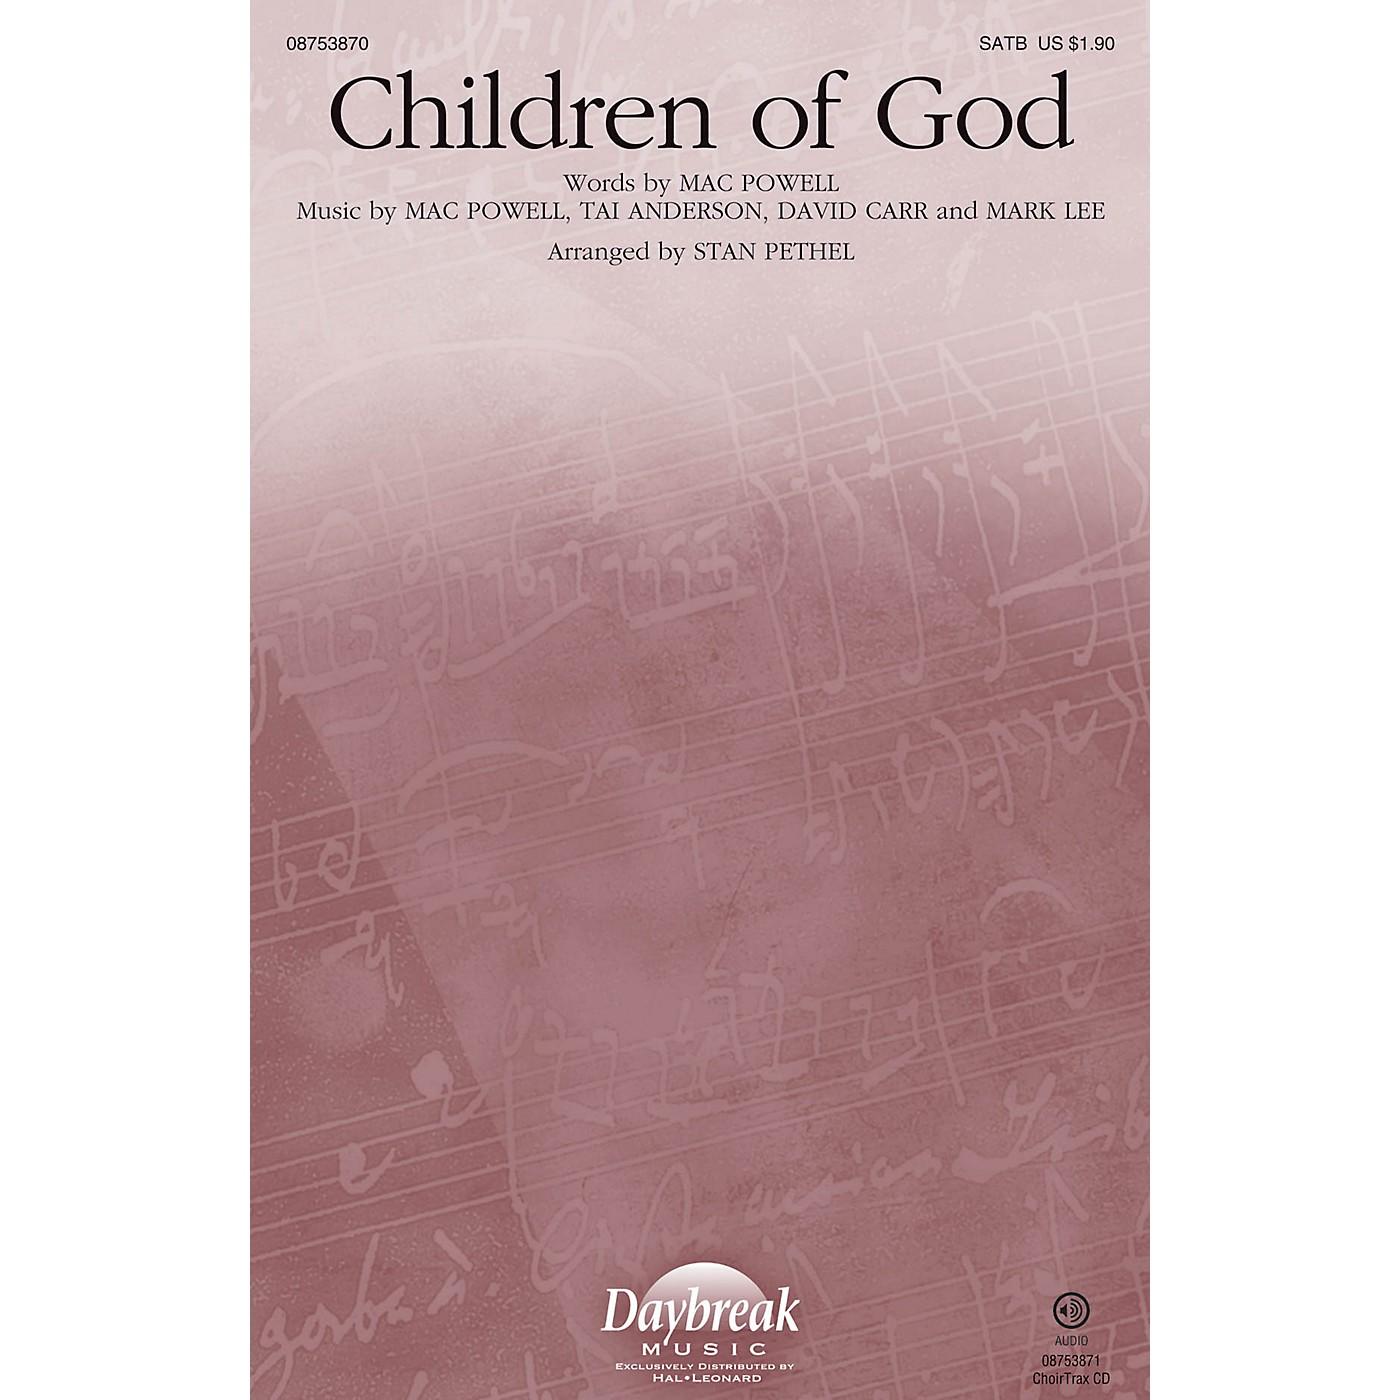 Daybreak Music Children of God SATB/CHILDREN'S CHOIR arranged by Stan Pethel thumbnail